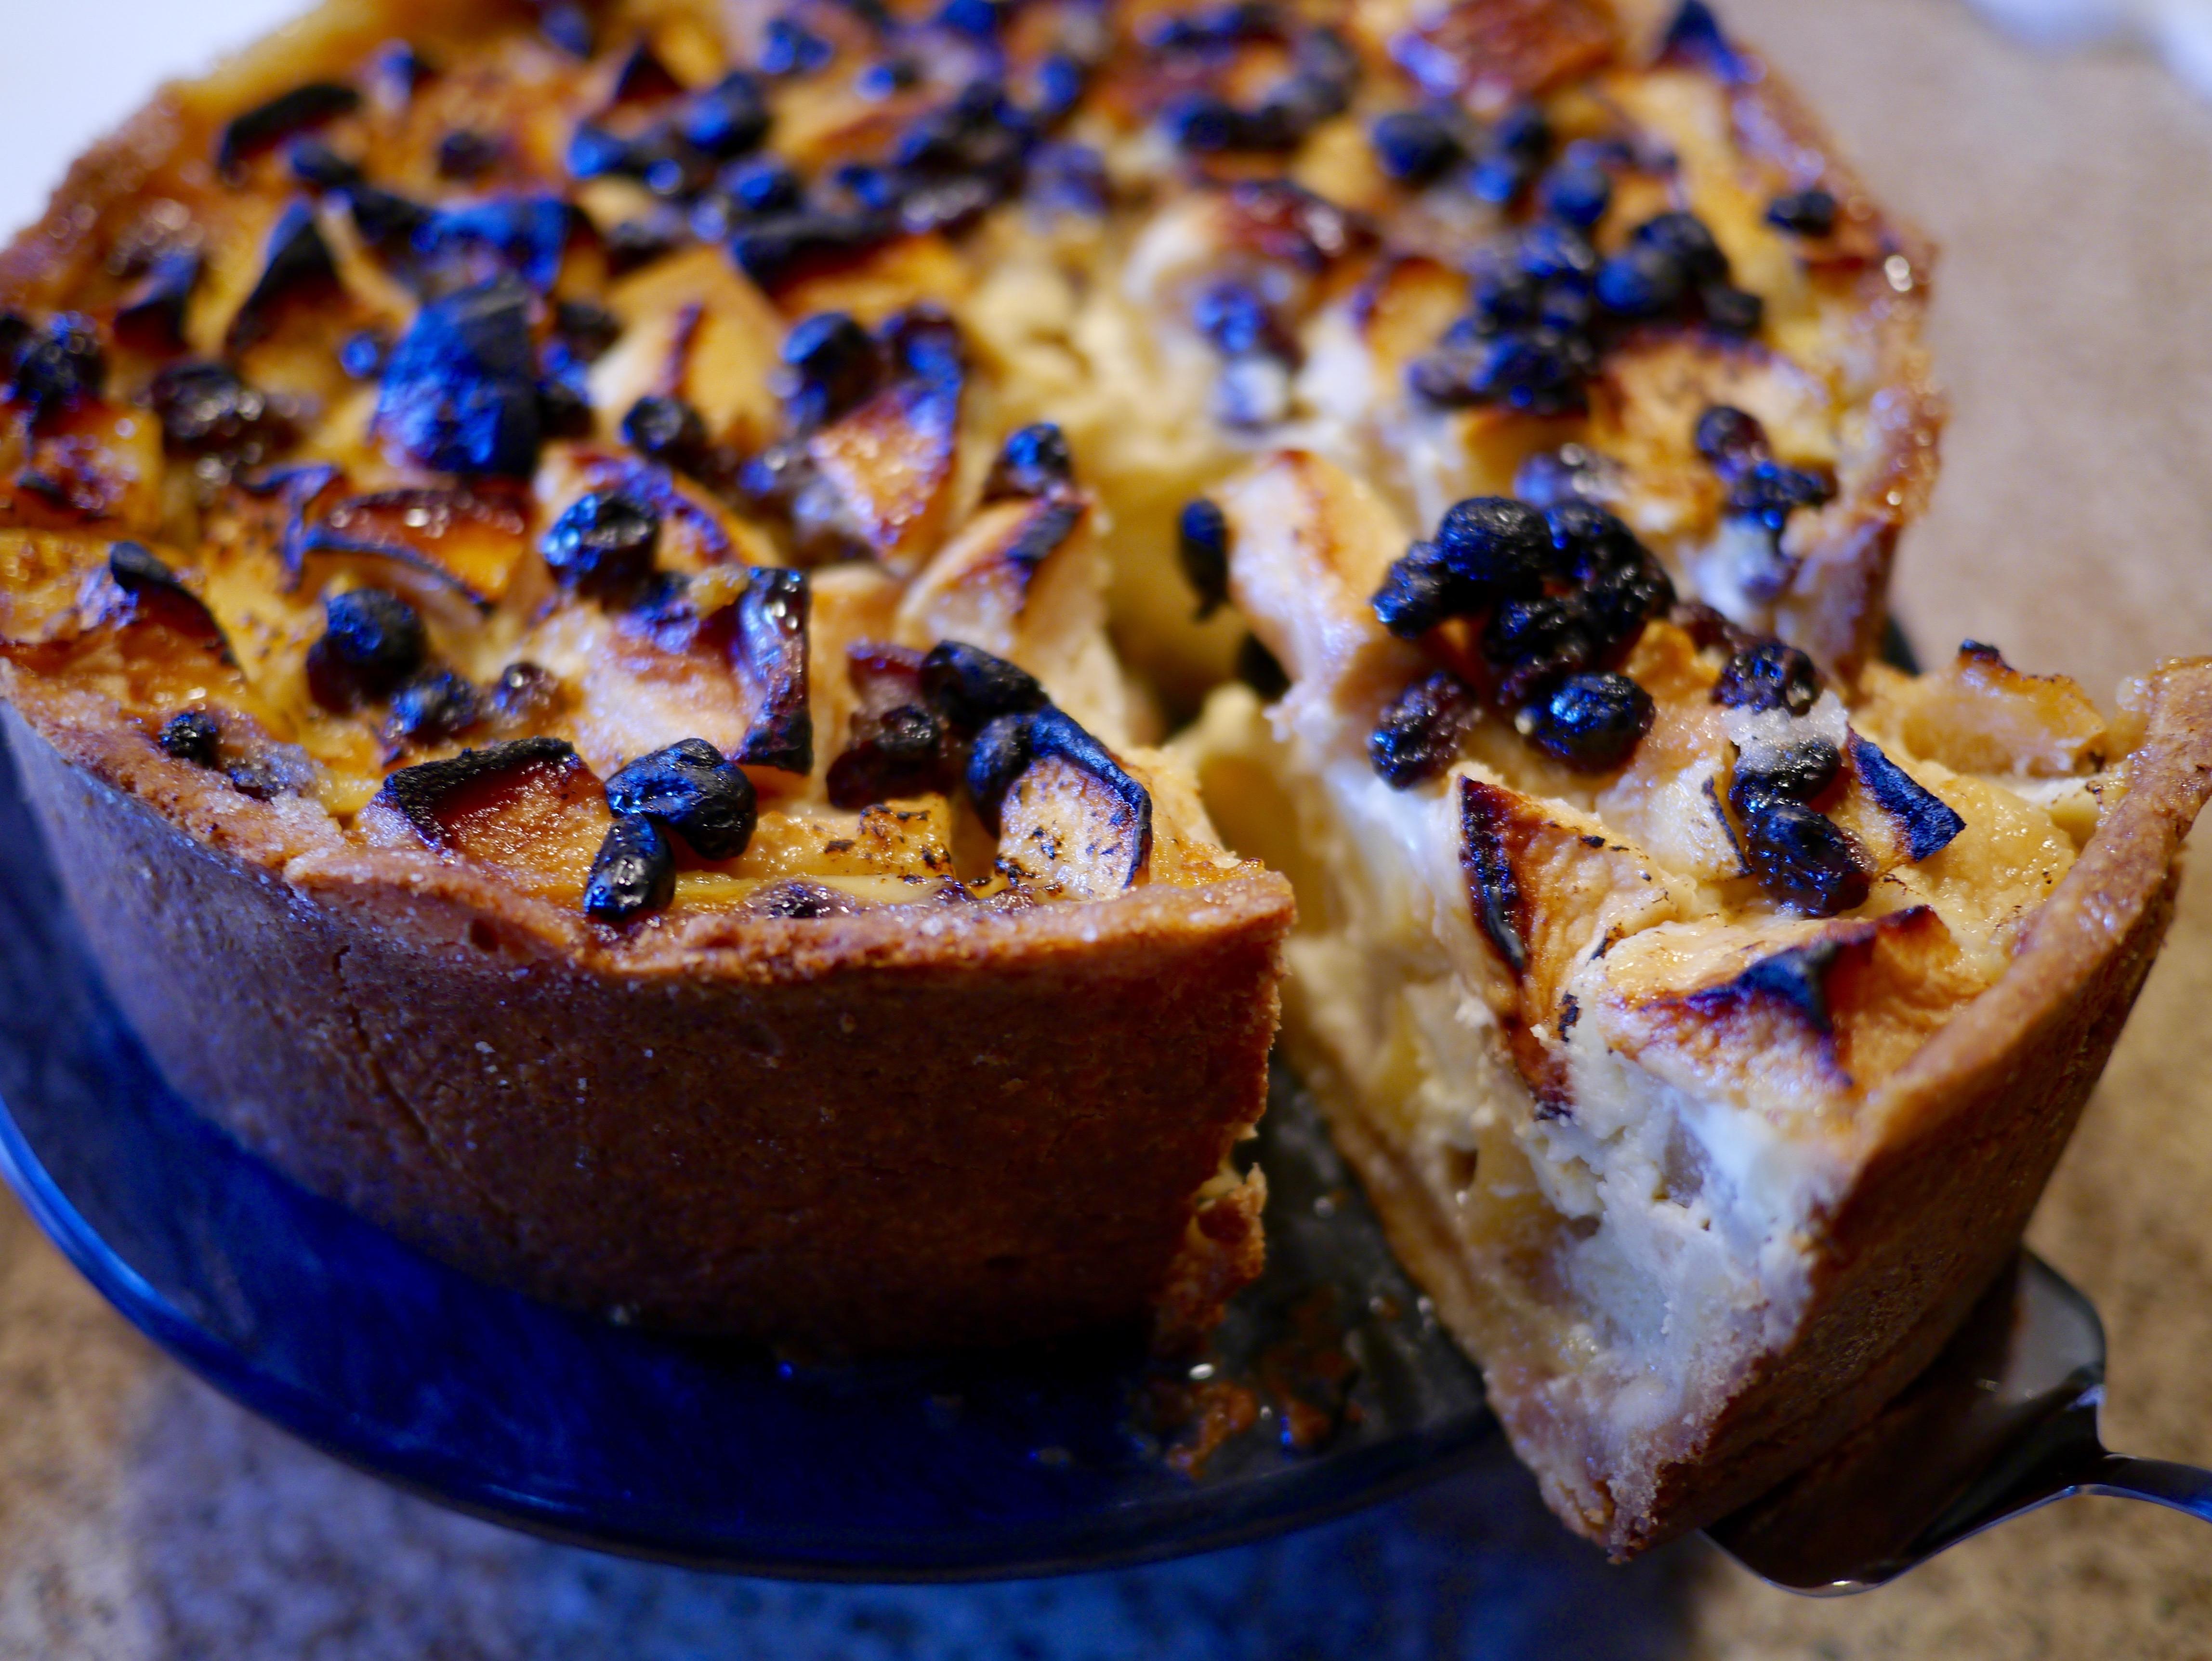 Kuchen P: Apple Kuchen: A Tall Apple-Custard Tourte